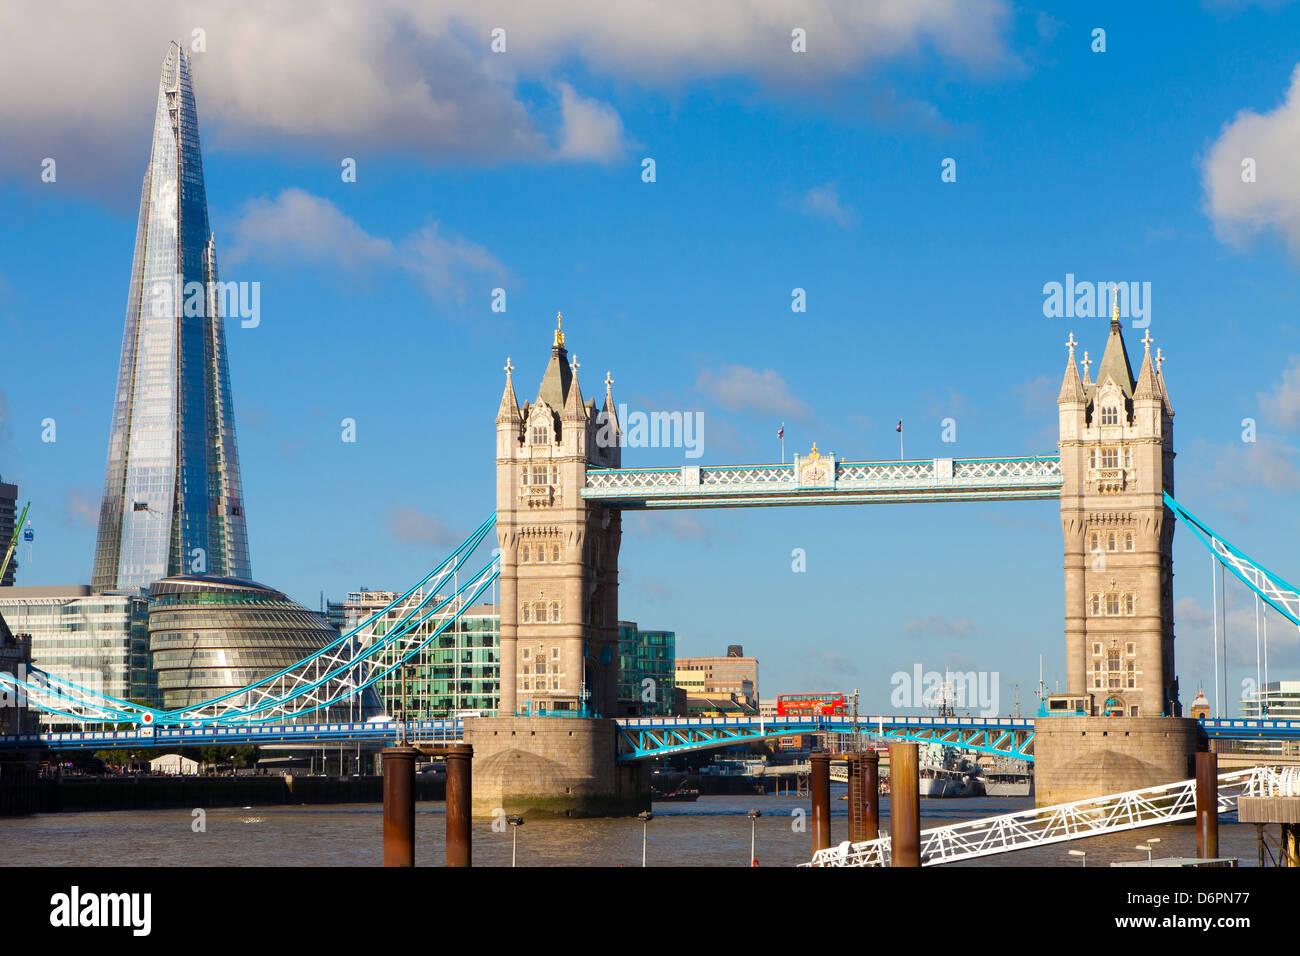 The Shard and Tower Bridge at night, London, England, United Kingdom, Europe - Stock Image